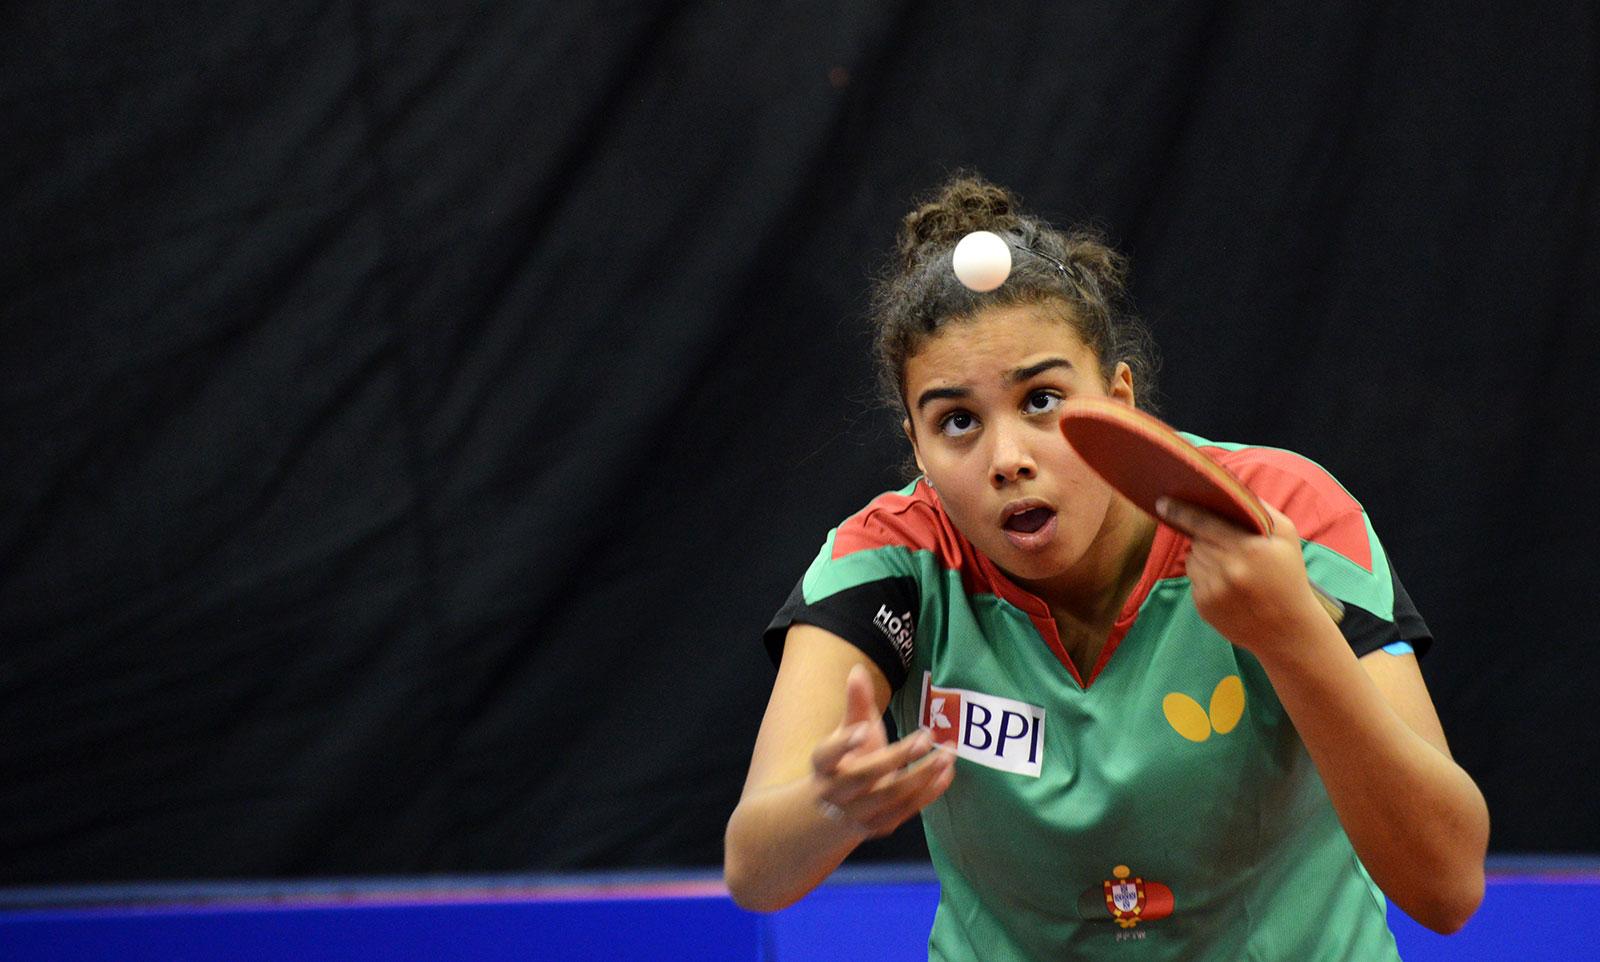 Matilde Pinto qualificada para Top 10 Europeu de jovens